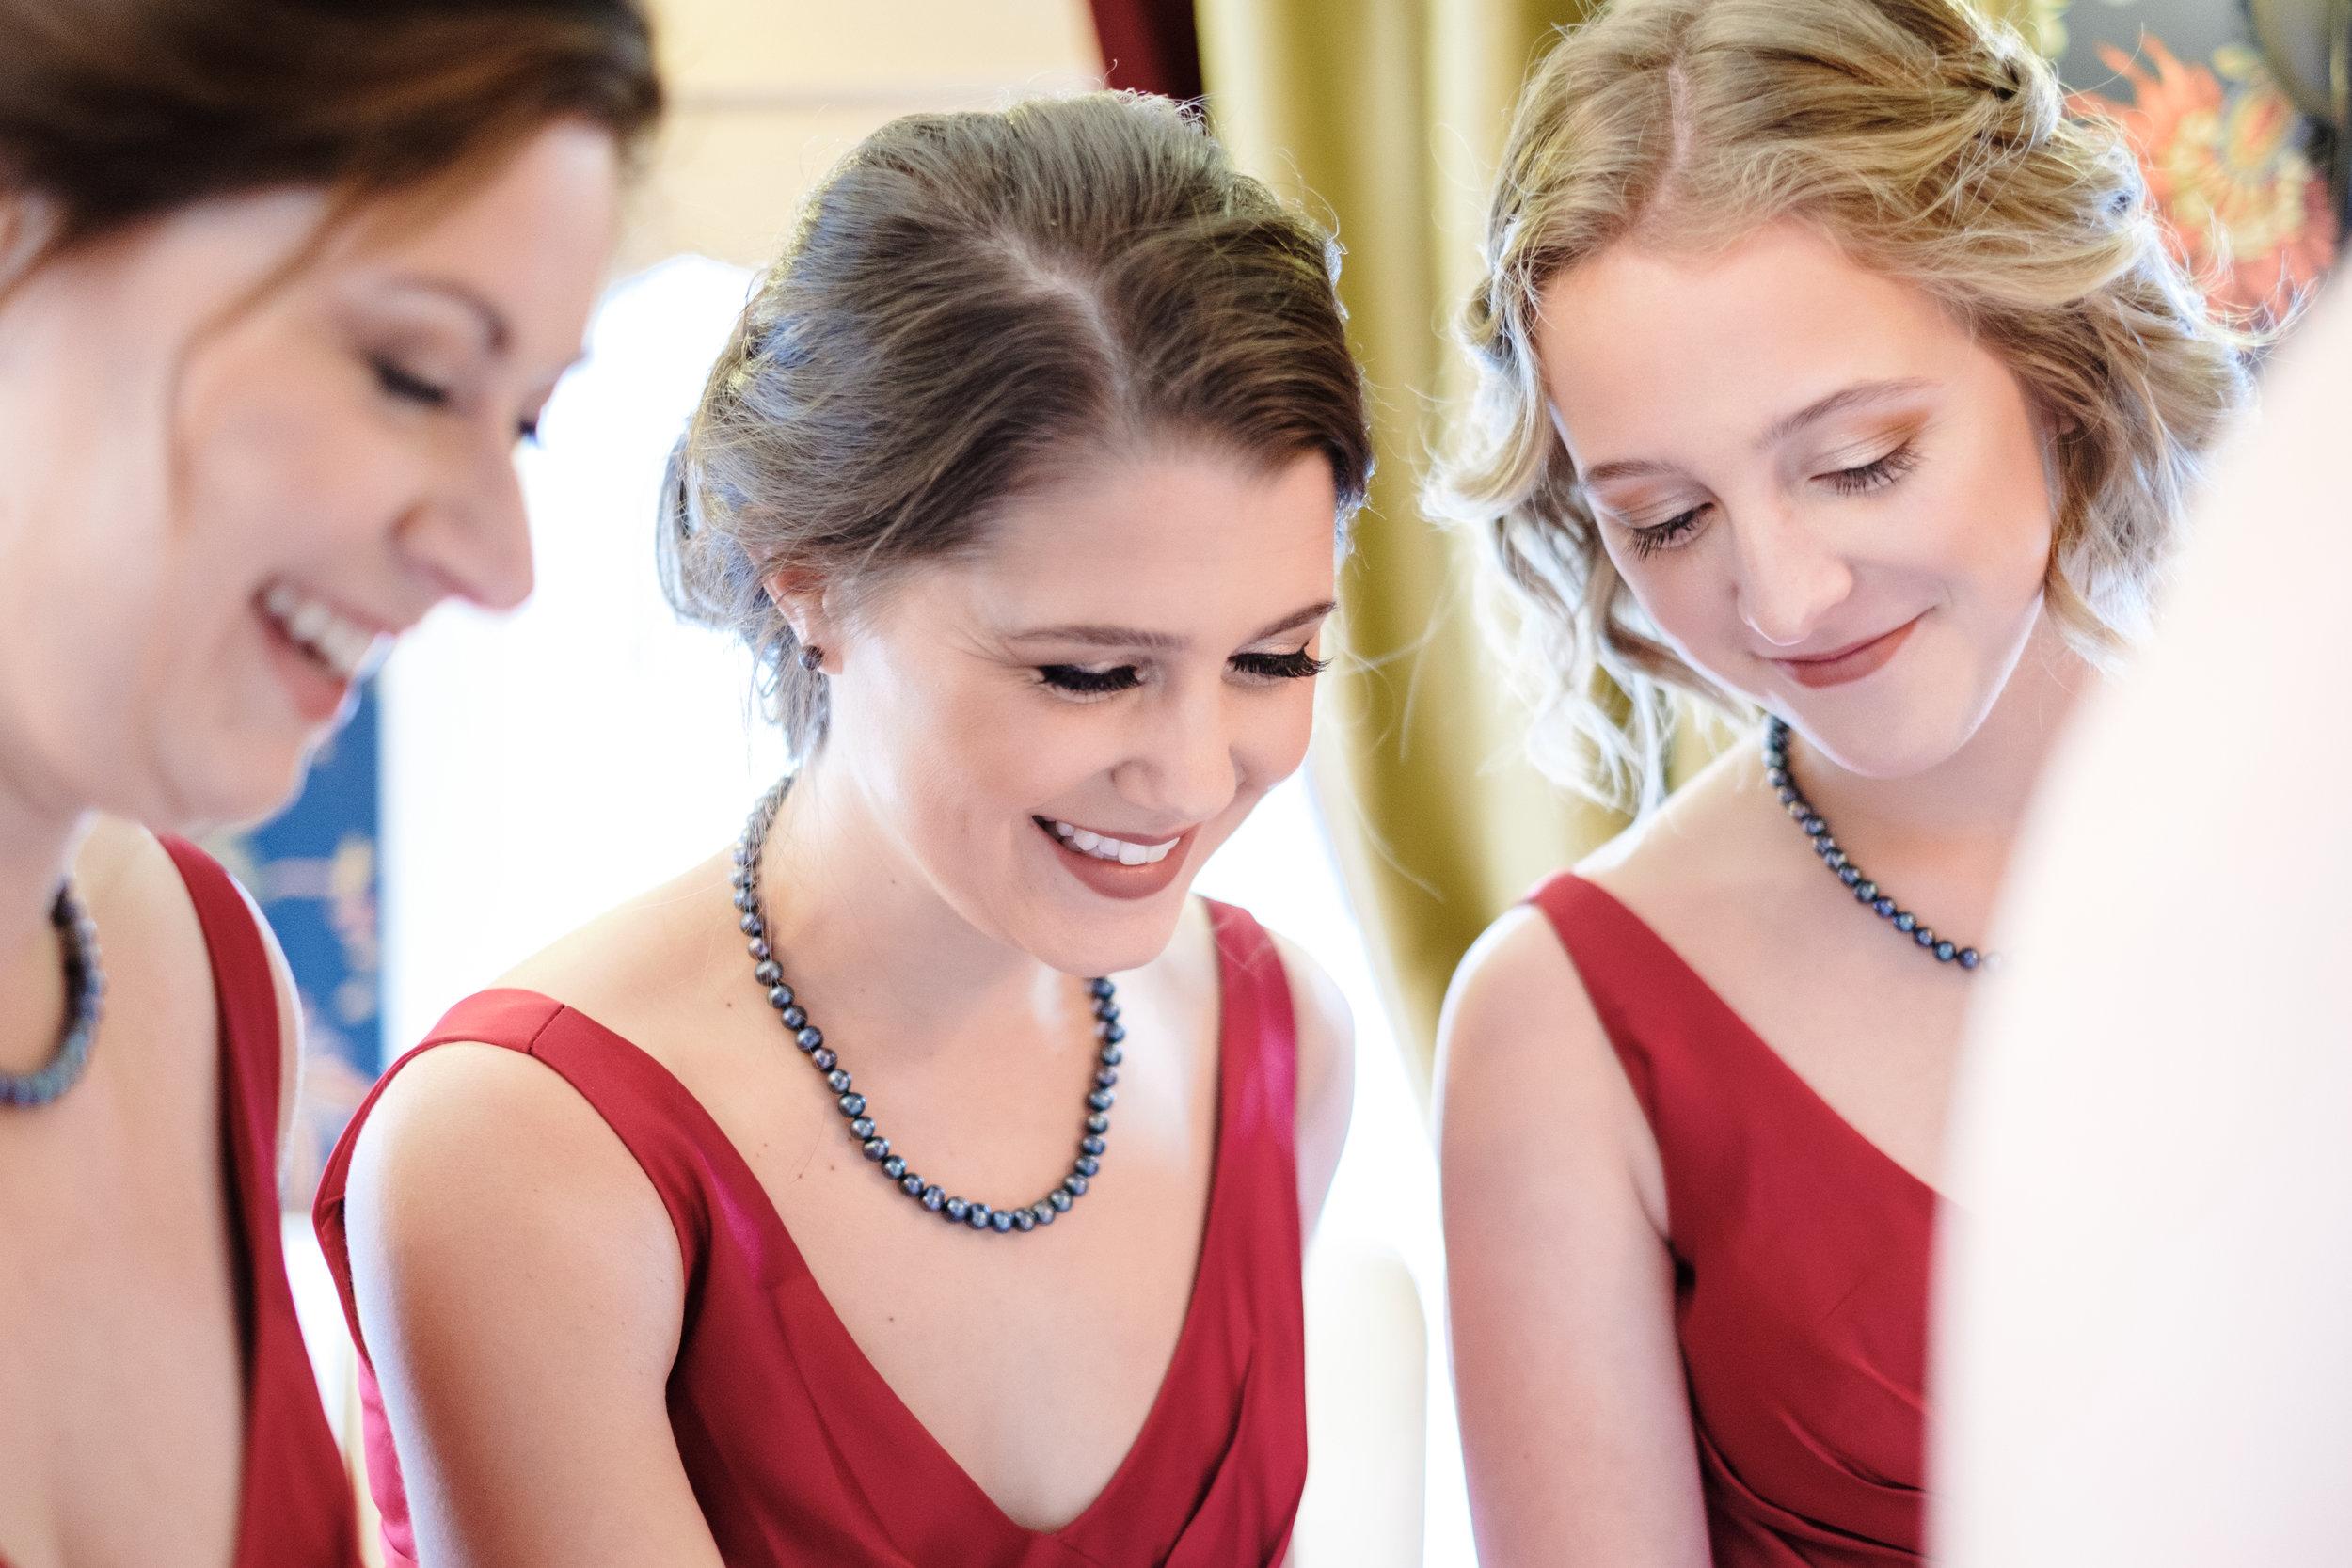 18-12-28 Corinne-Henry-Pavilion-Wedding-72.jpg